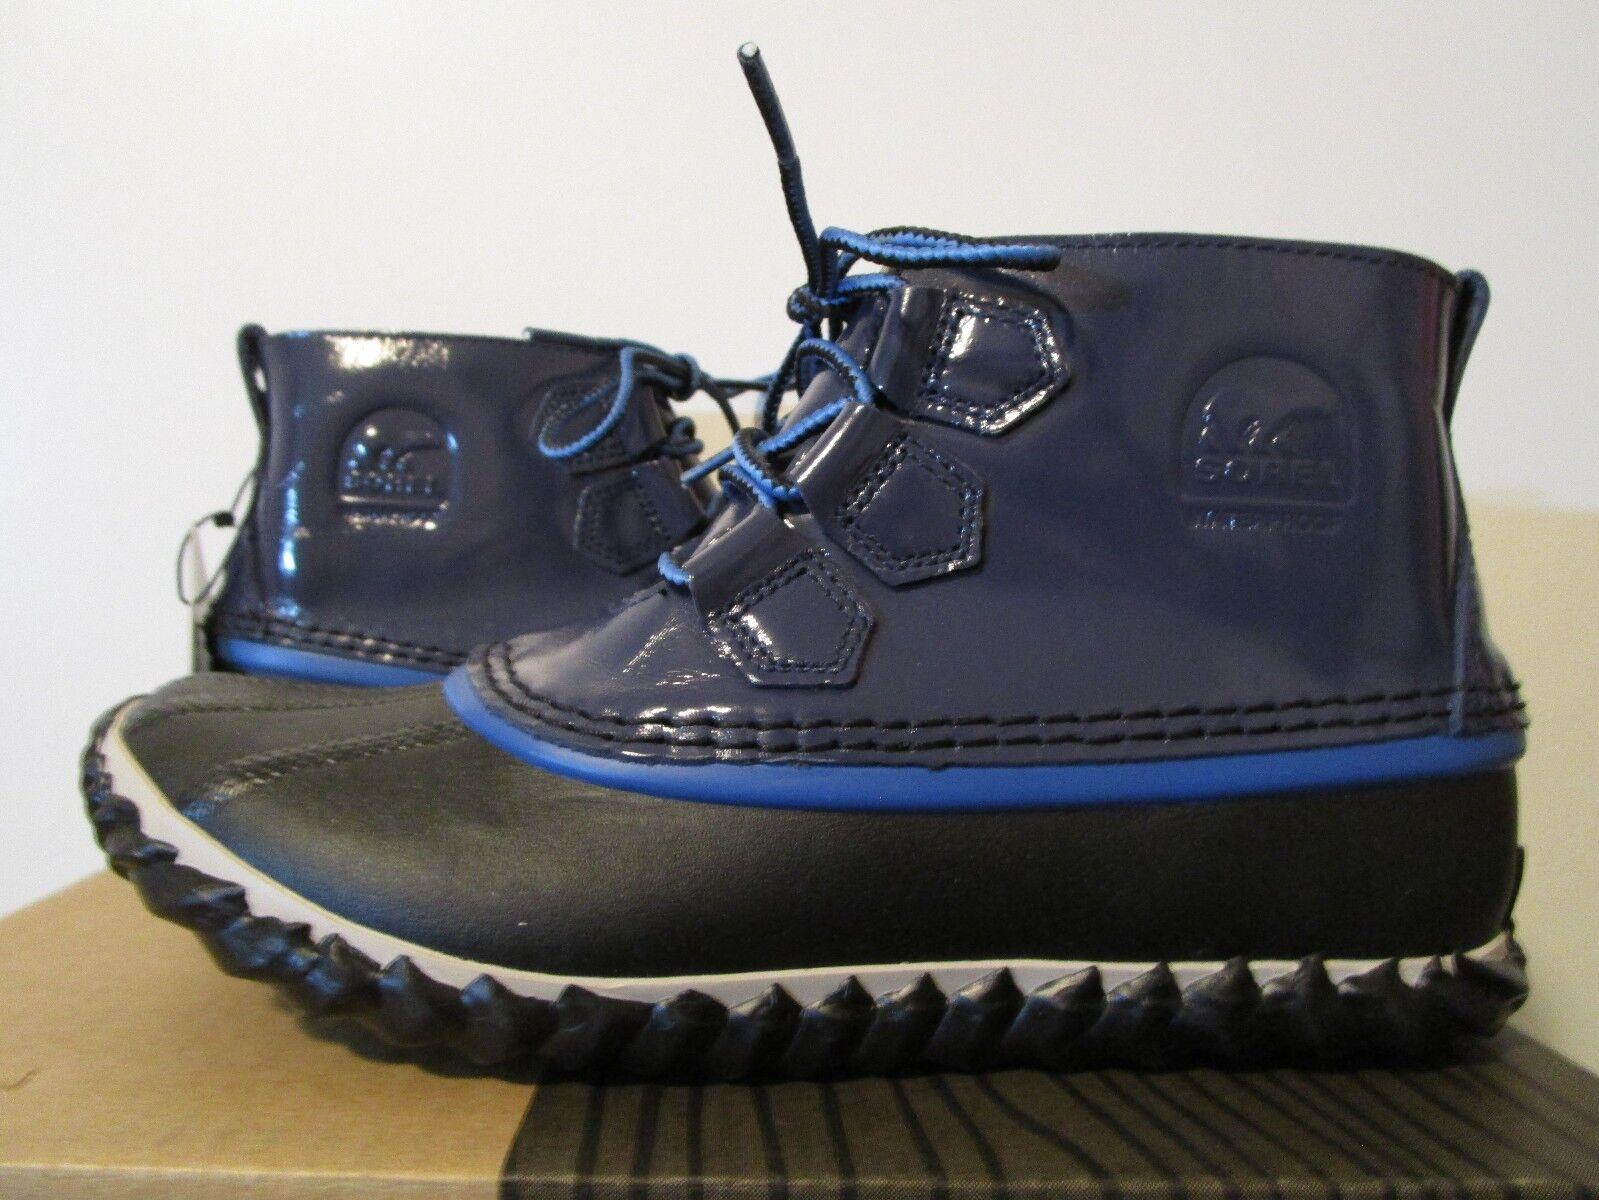 Damenschuhe Sorel Out N About Waterproof Schuhes Leder Fashion Rain Stiefel Nocturnal